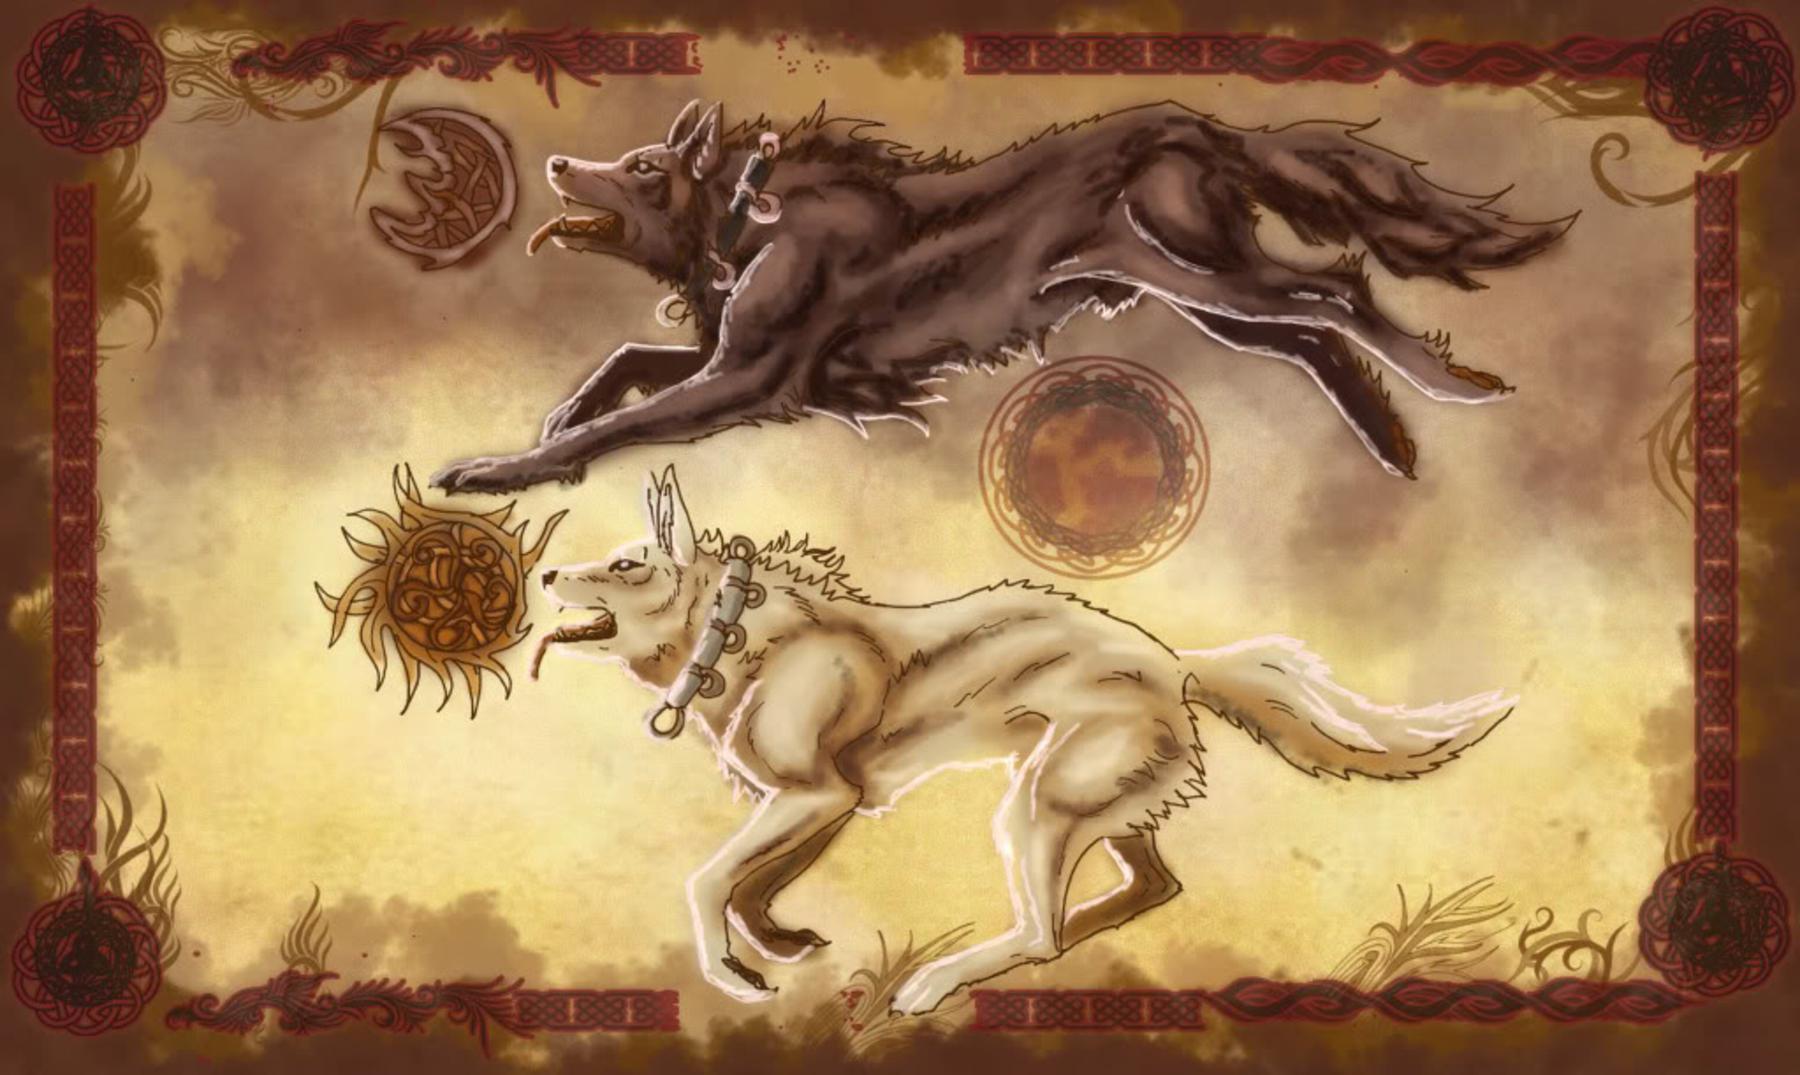 La leyenda nórdica de Sköll y Hati